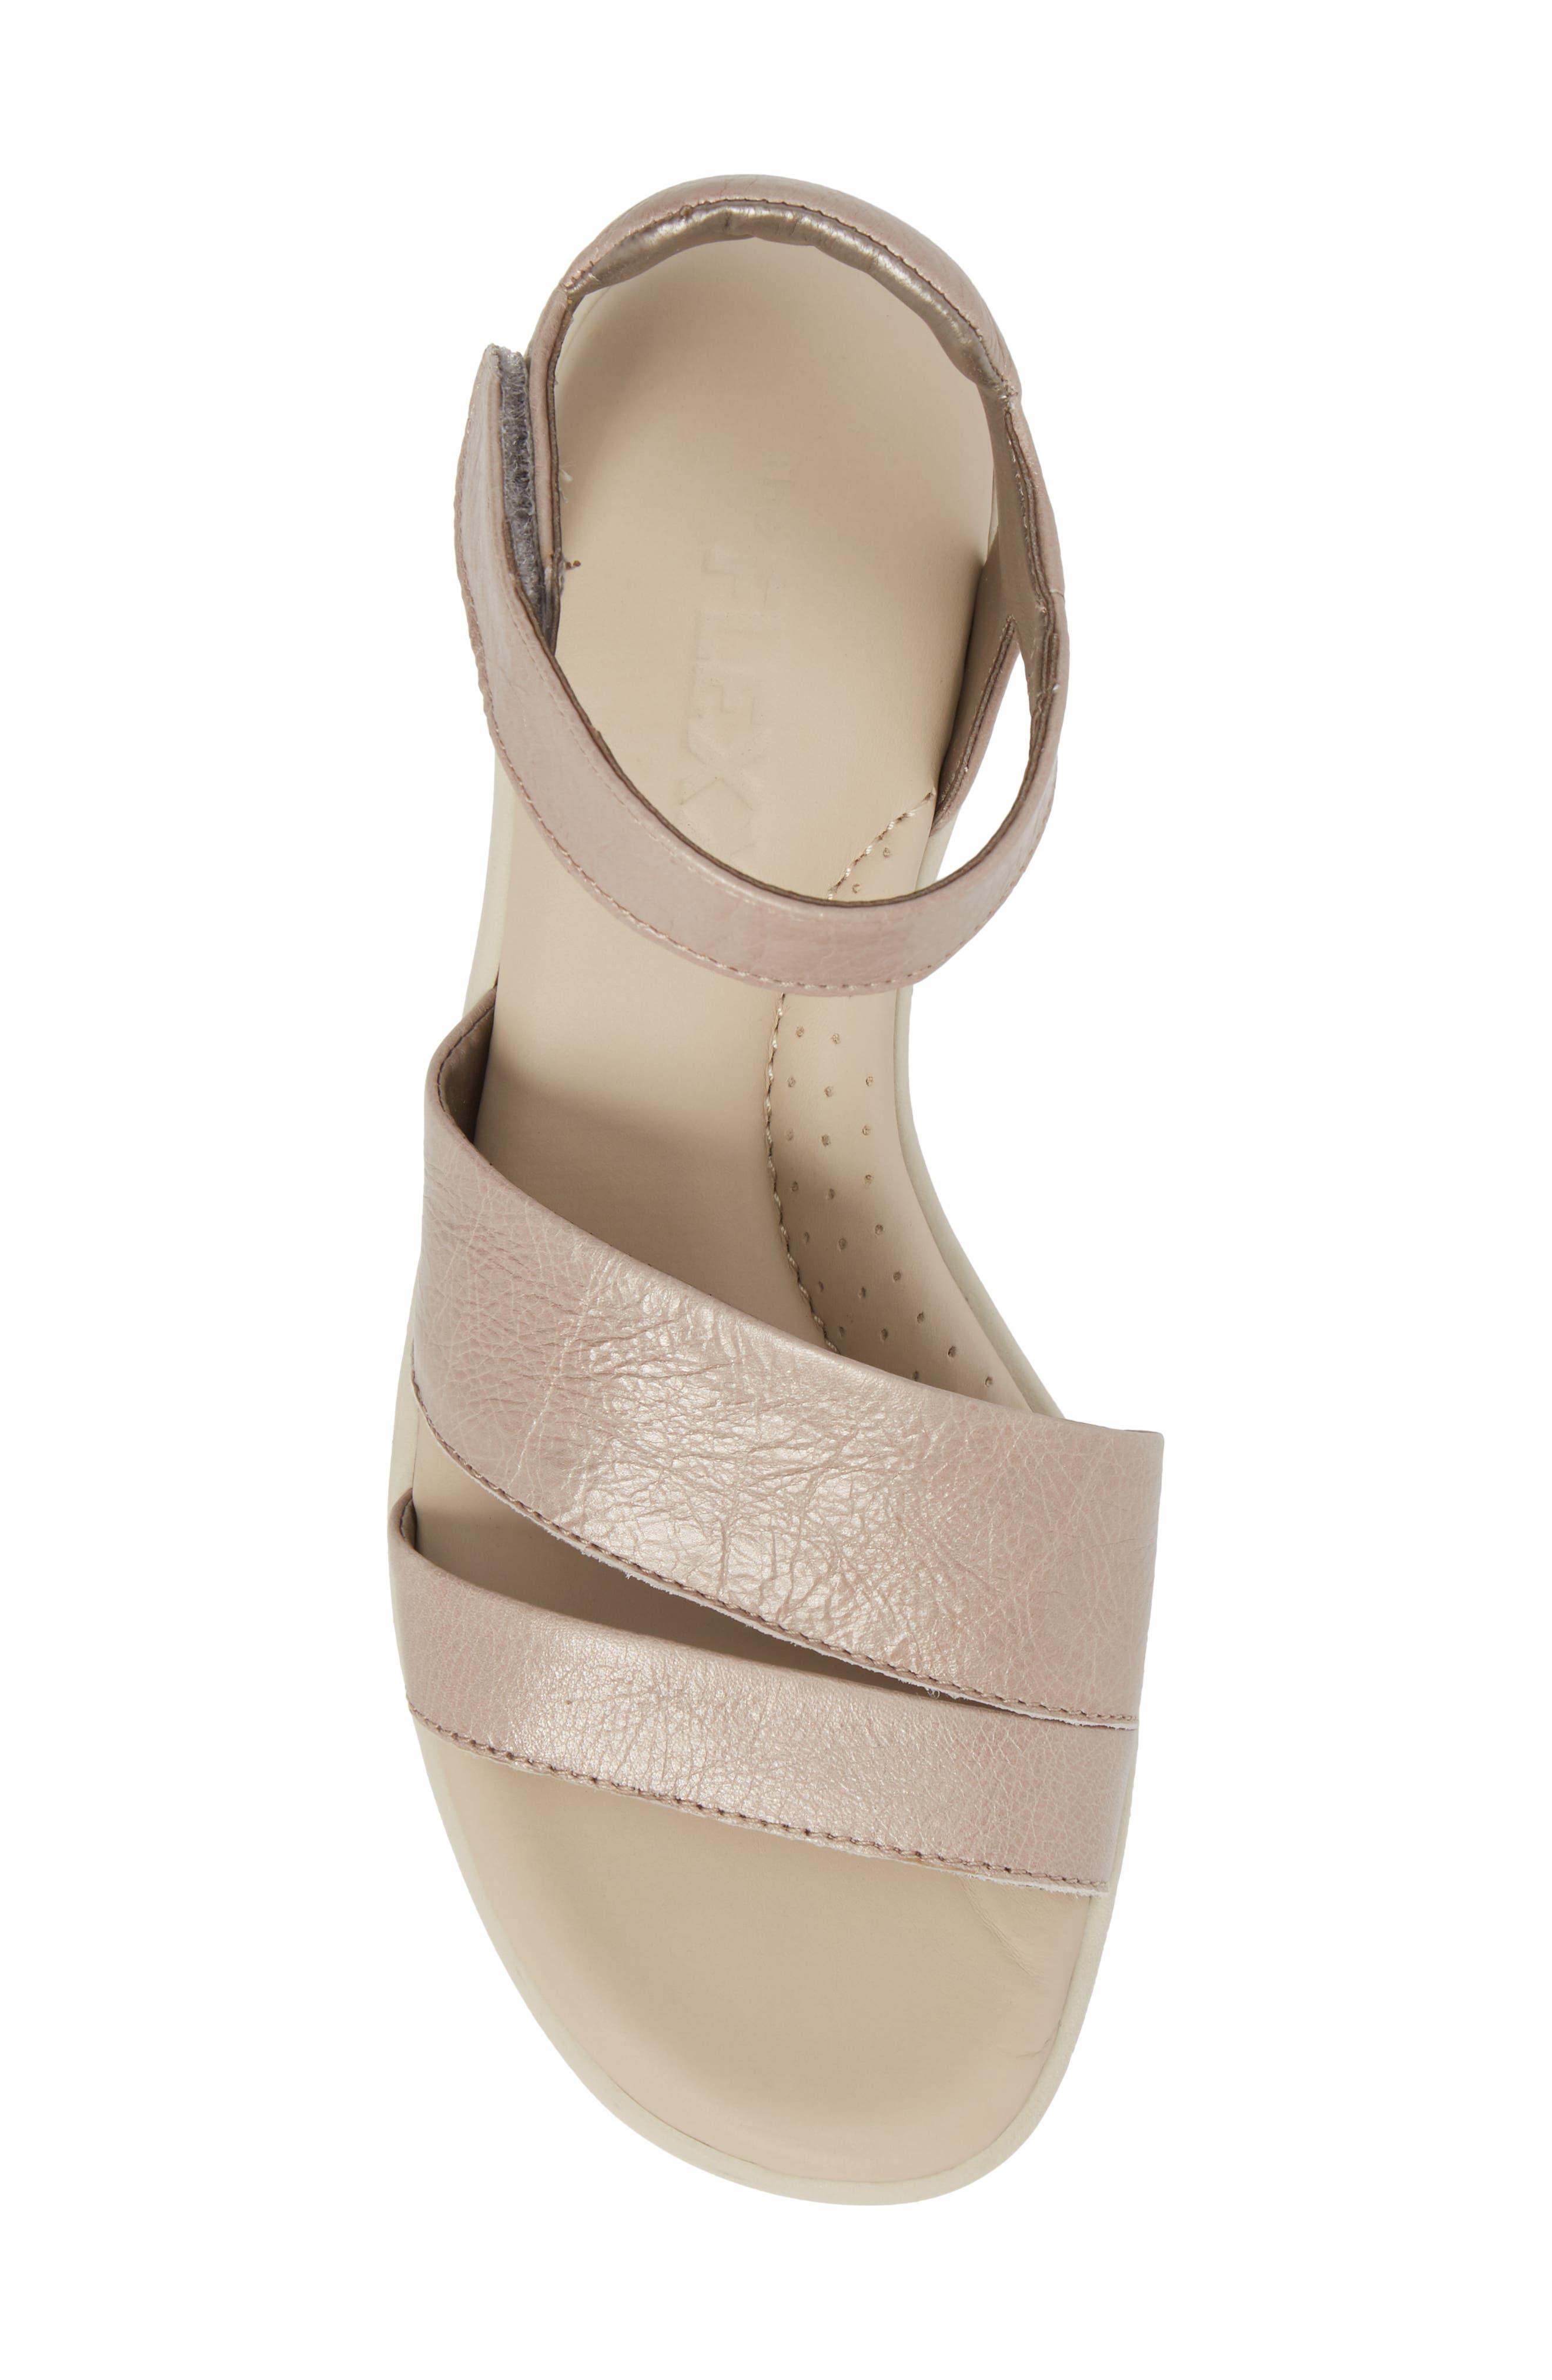 Crossover Ankle Strap Sandal,                             Alternate thumbnail 5, color,                             HAZE CRACKLED LEATHER